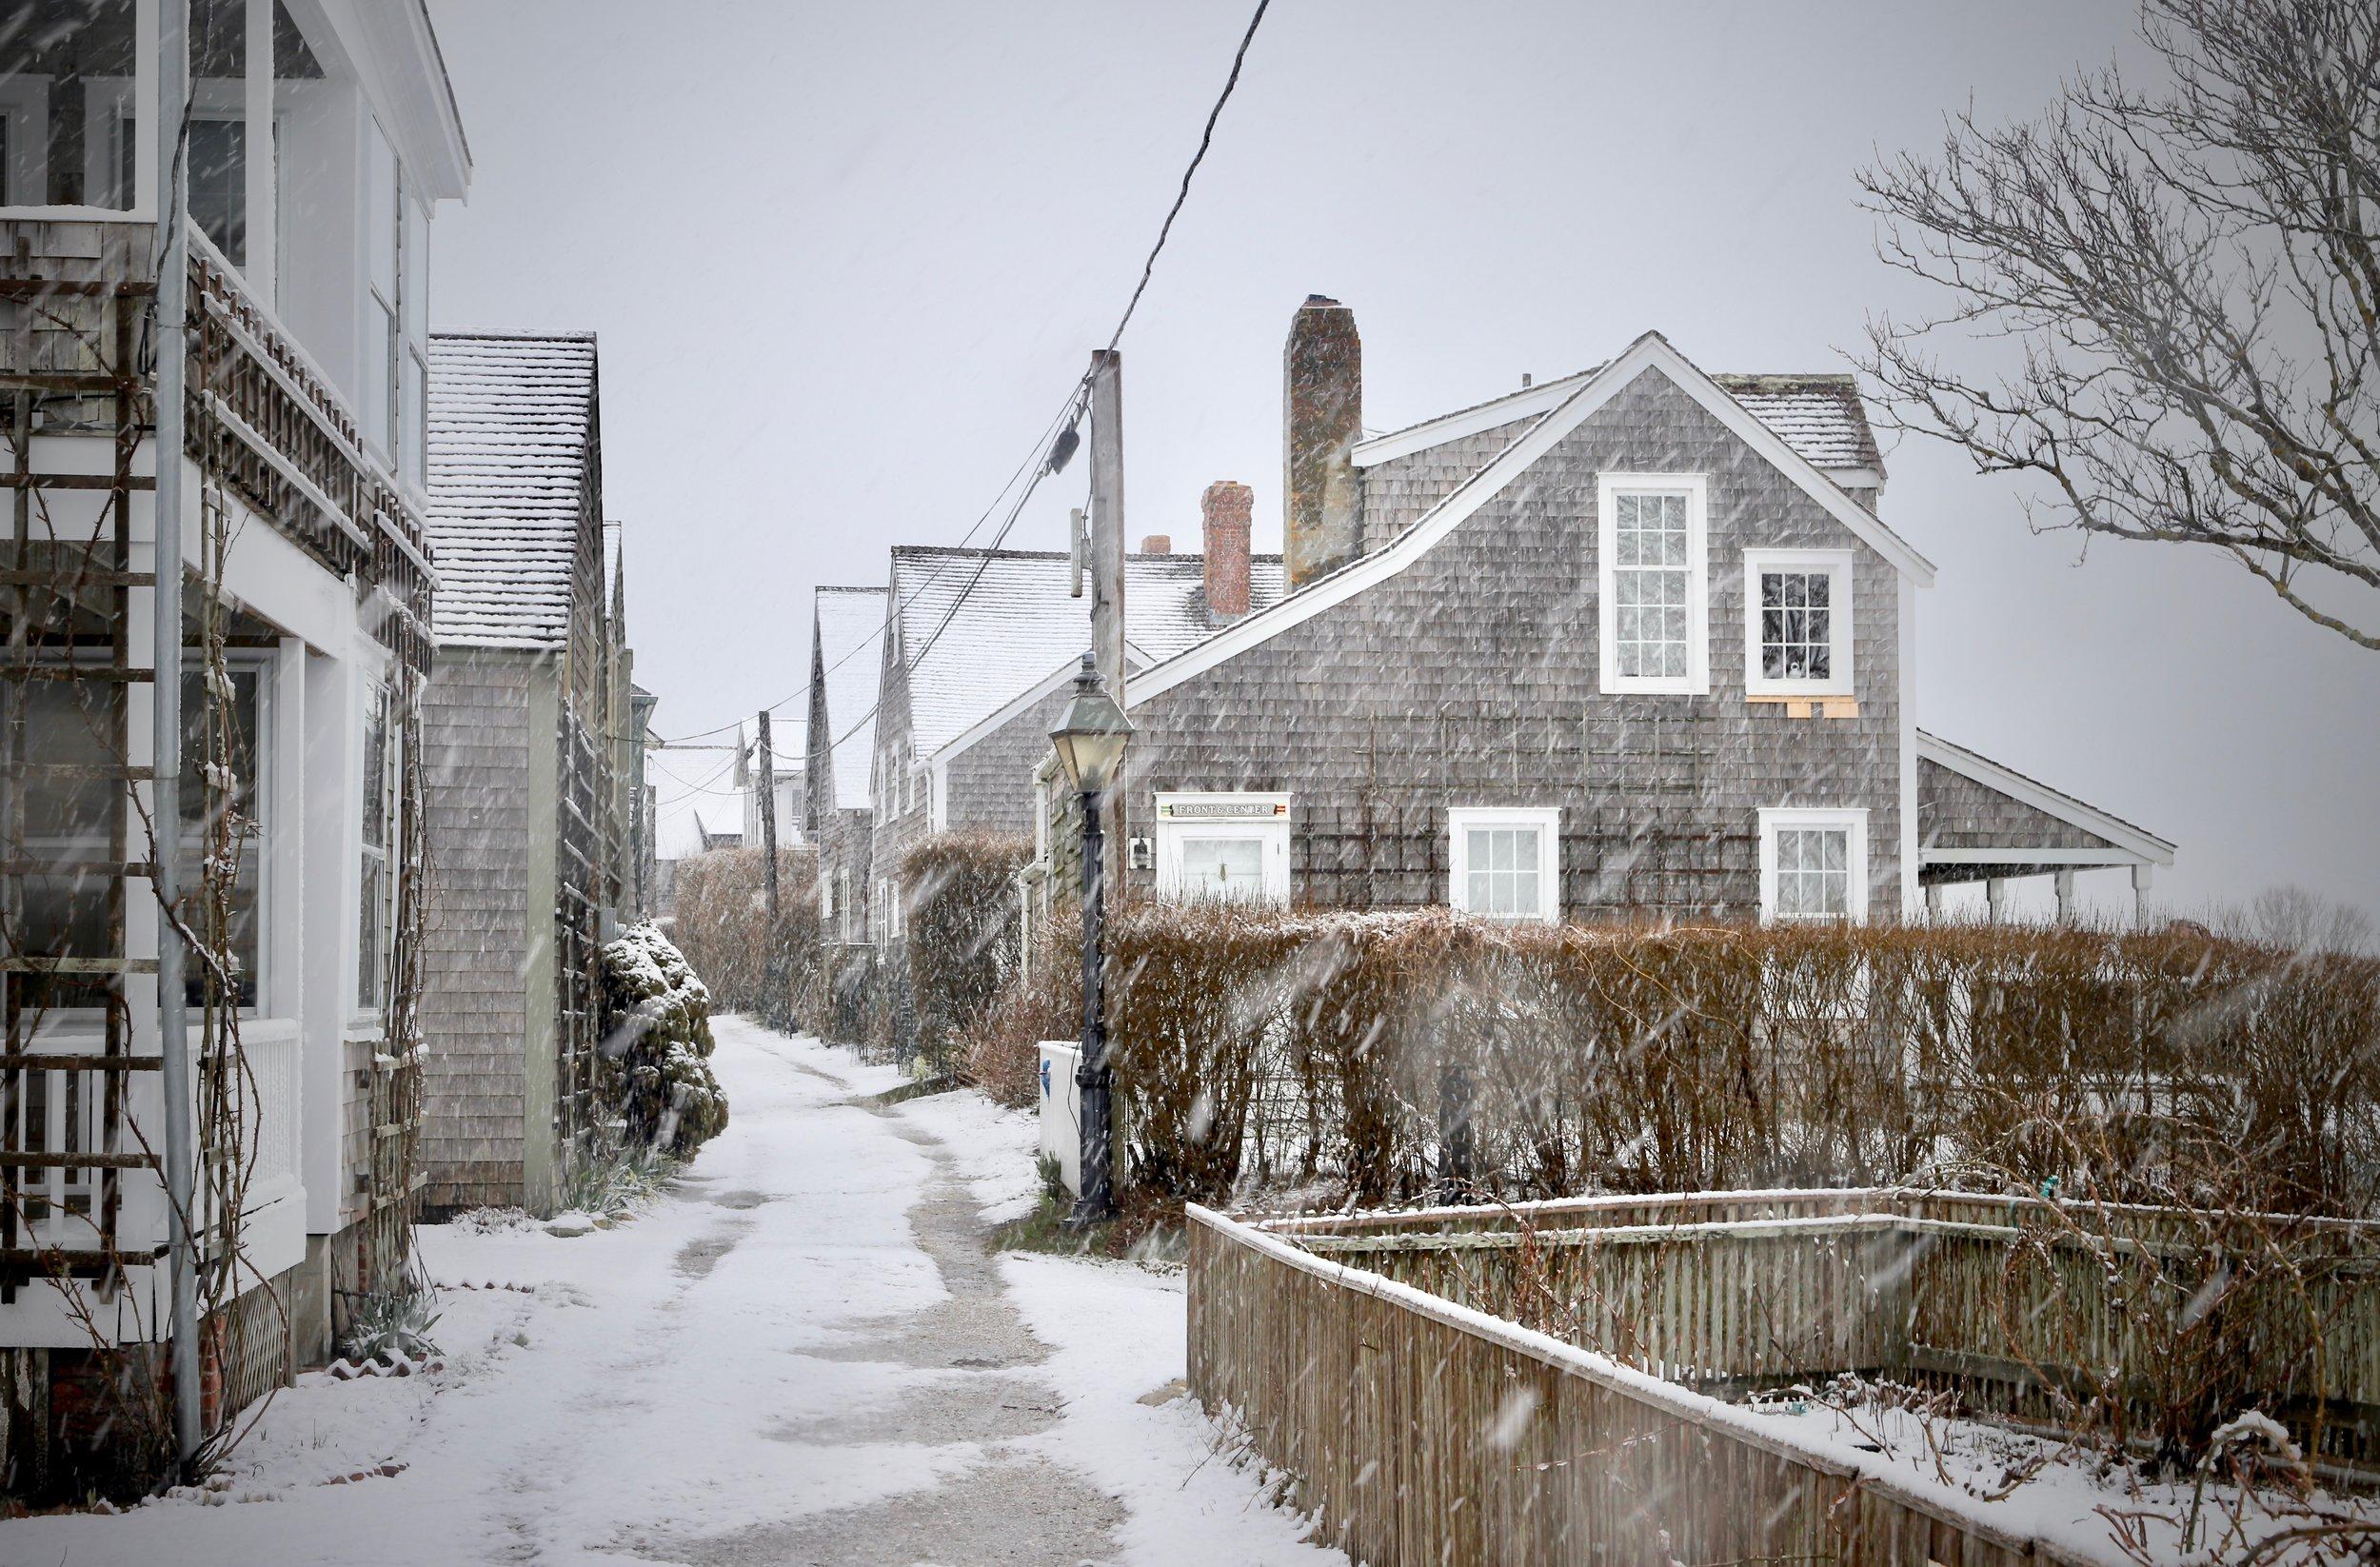 Sconset Snow 3.jpg